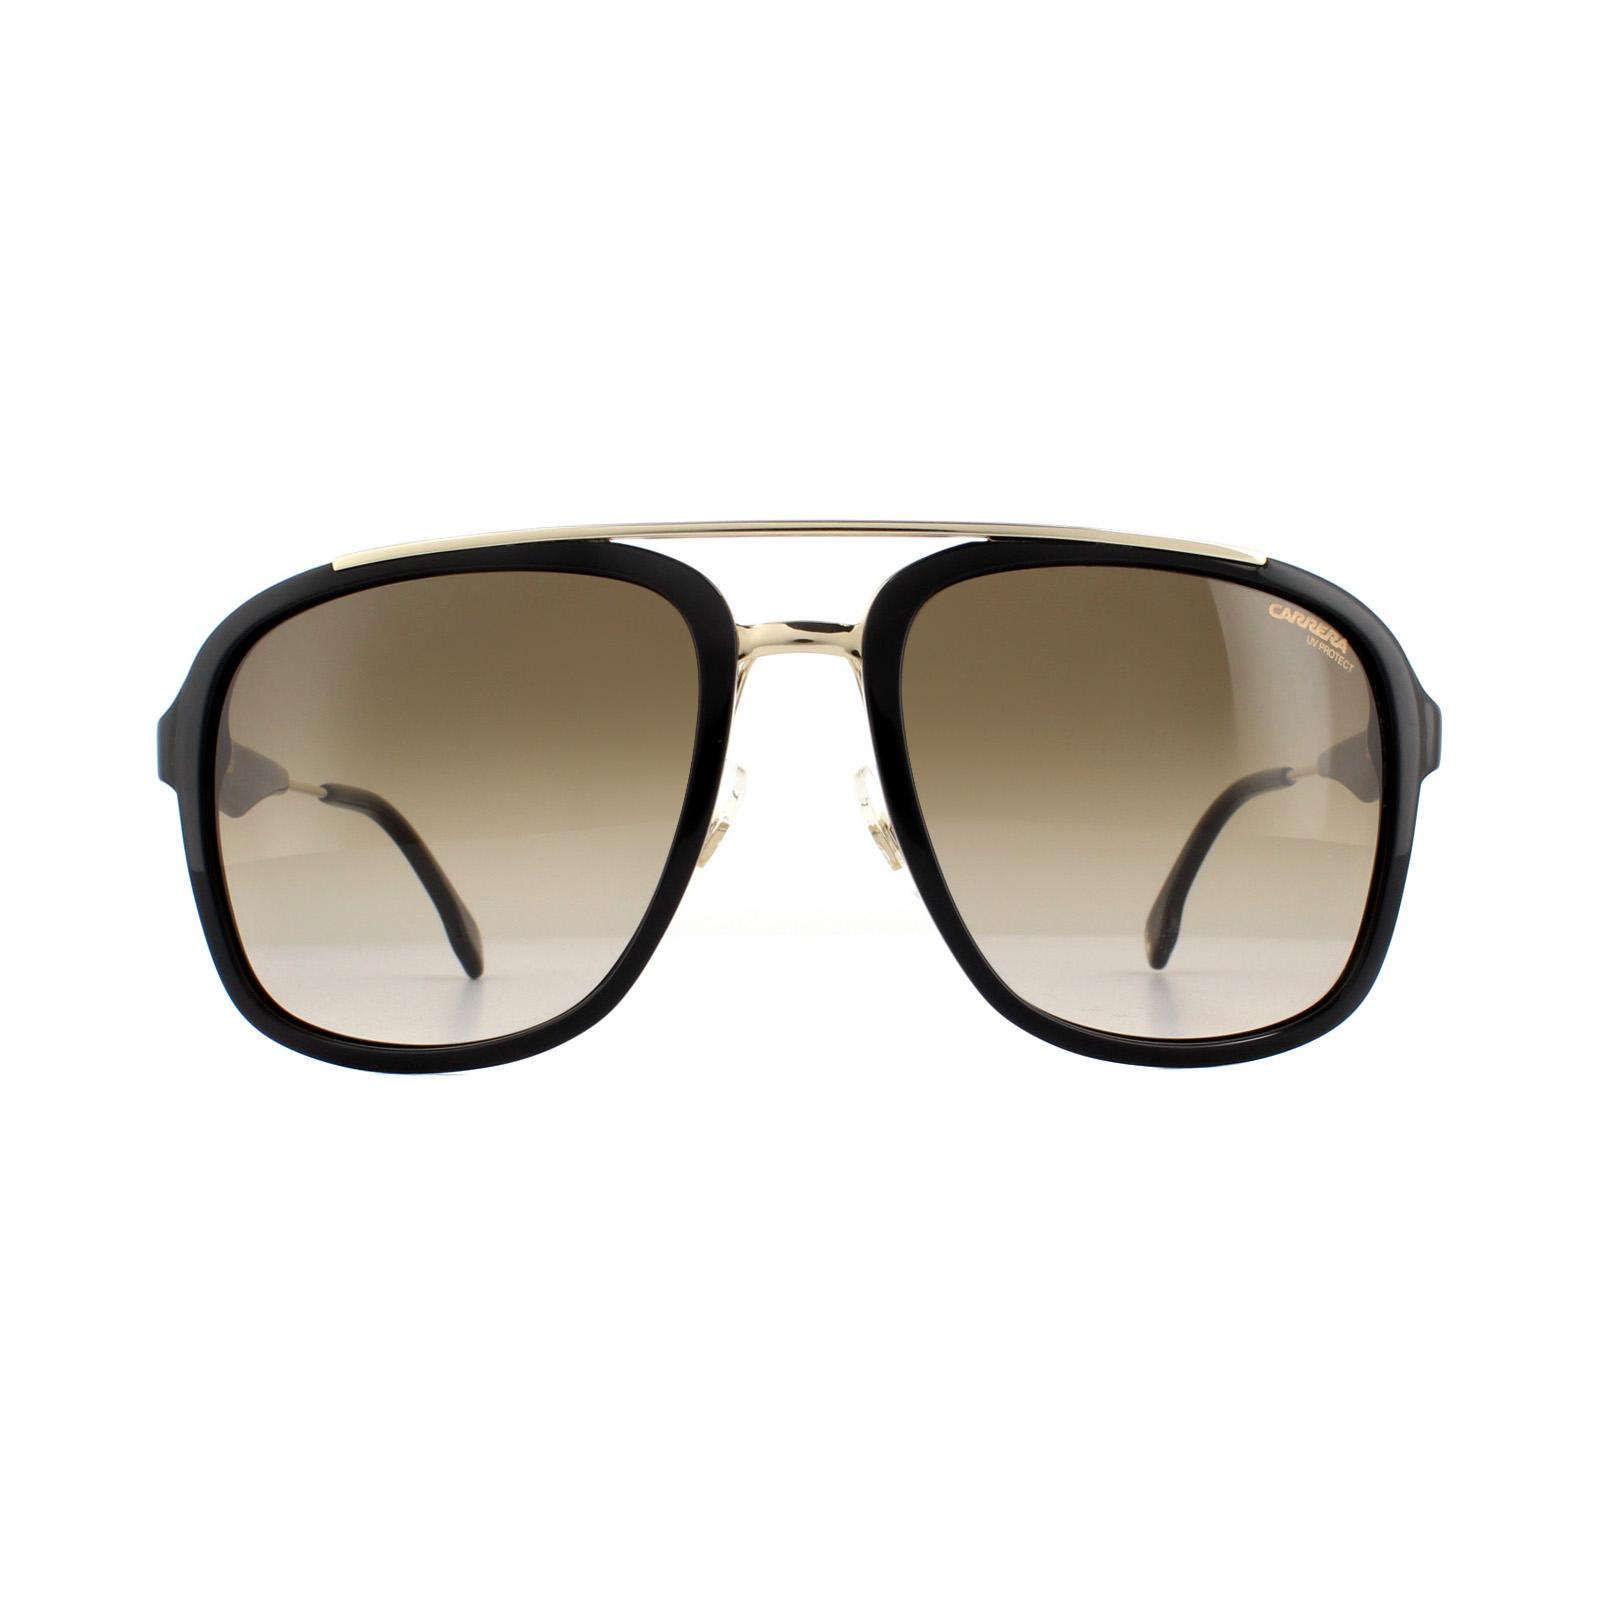 Carrera Sunglasses Carrera 133//S 2M2 HA Black Gold Brown Gradient